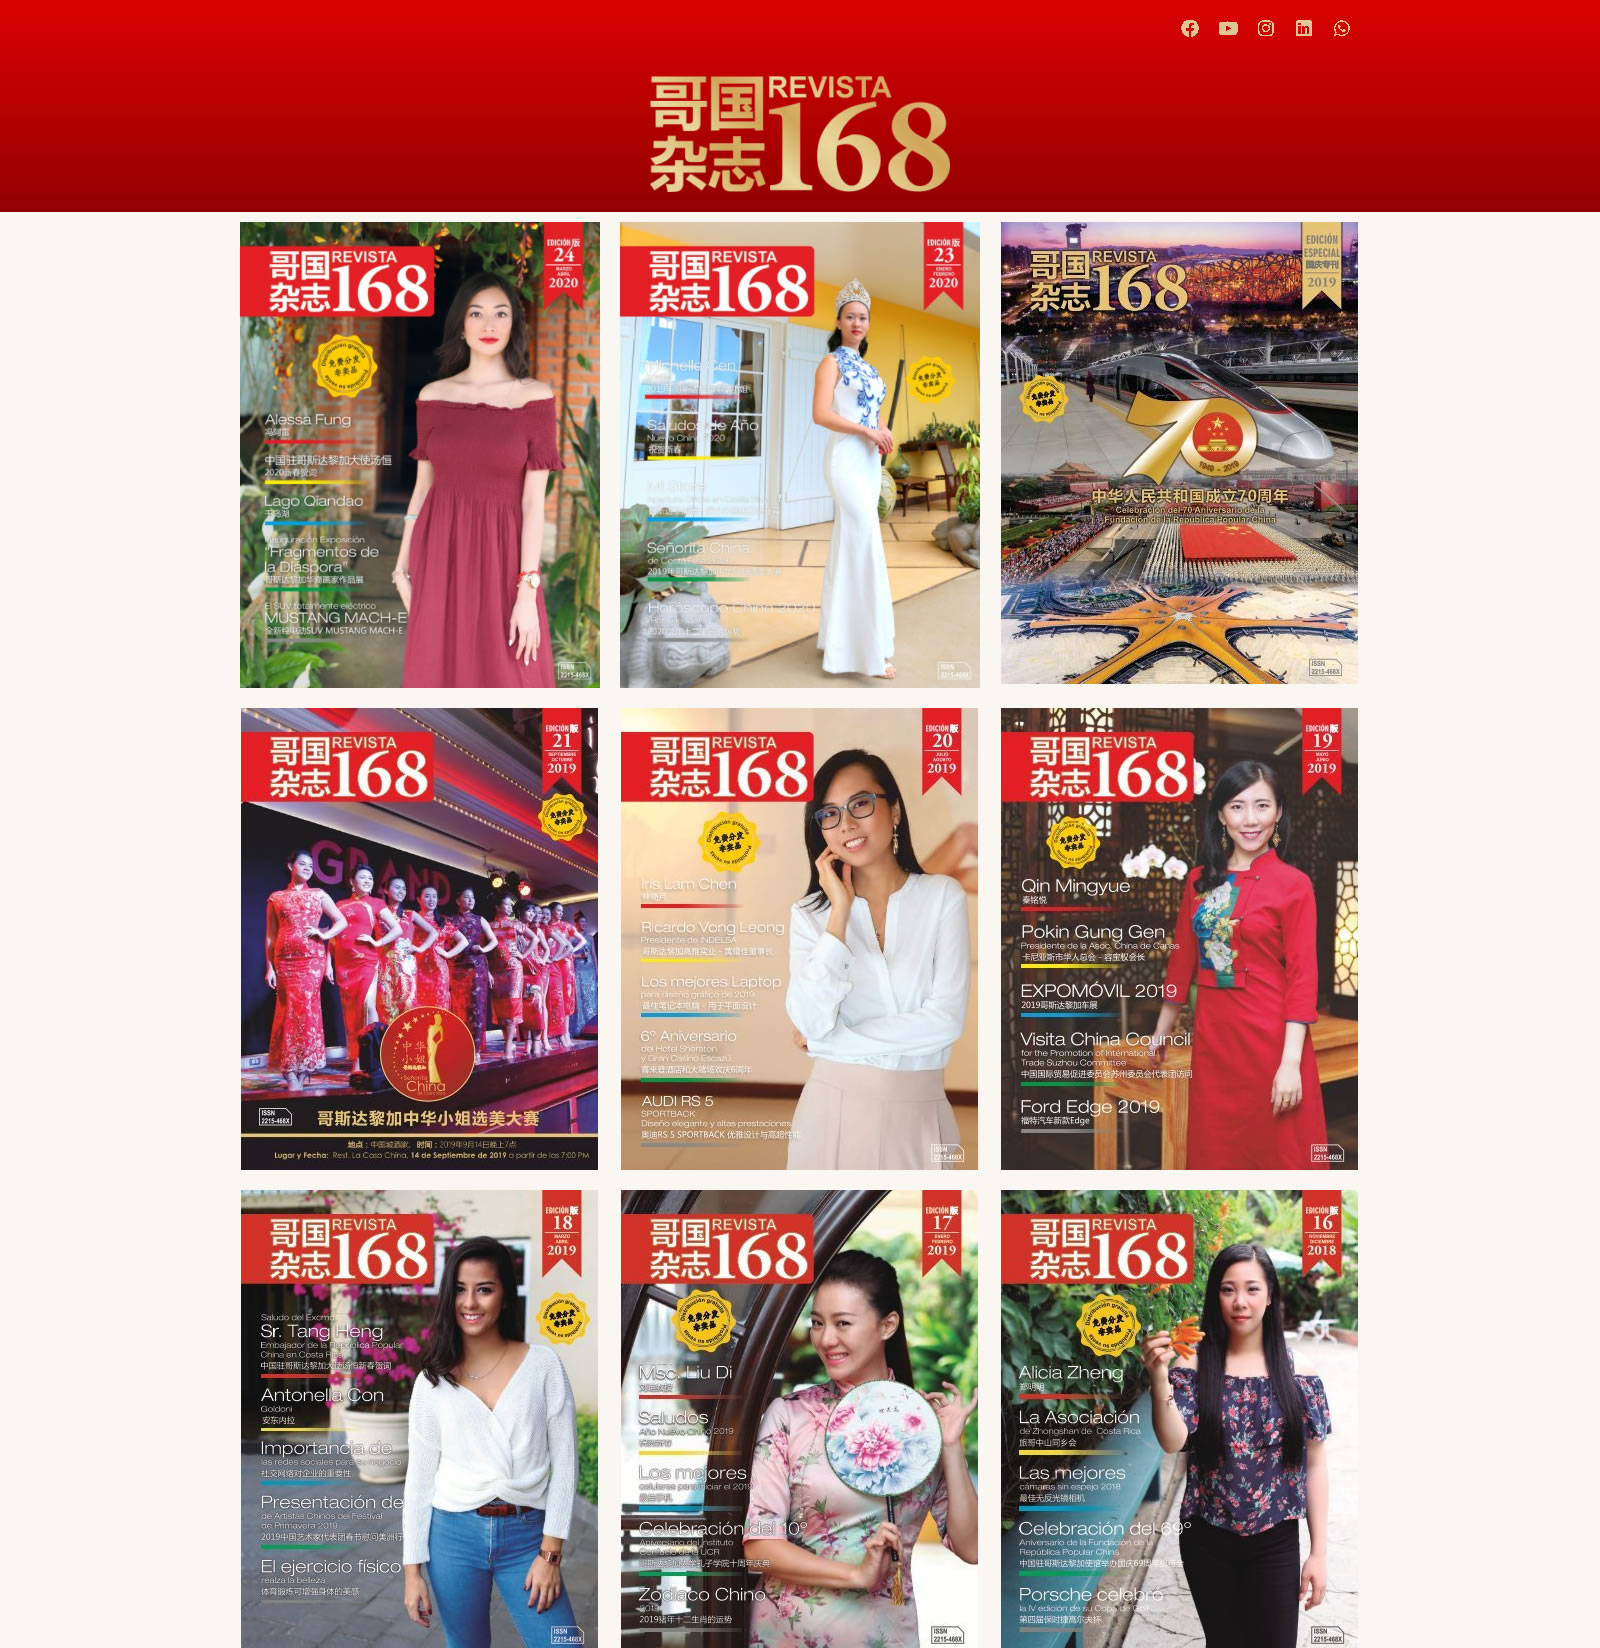 Revista 168 哥国杂志 168